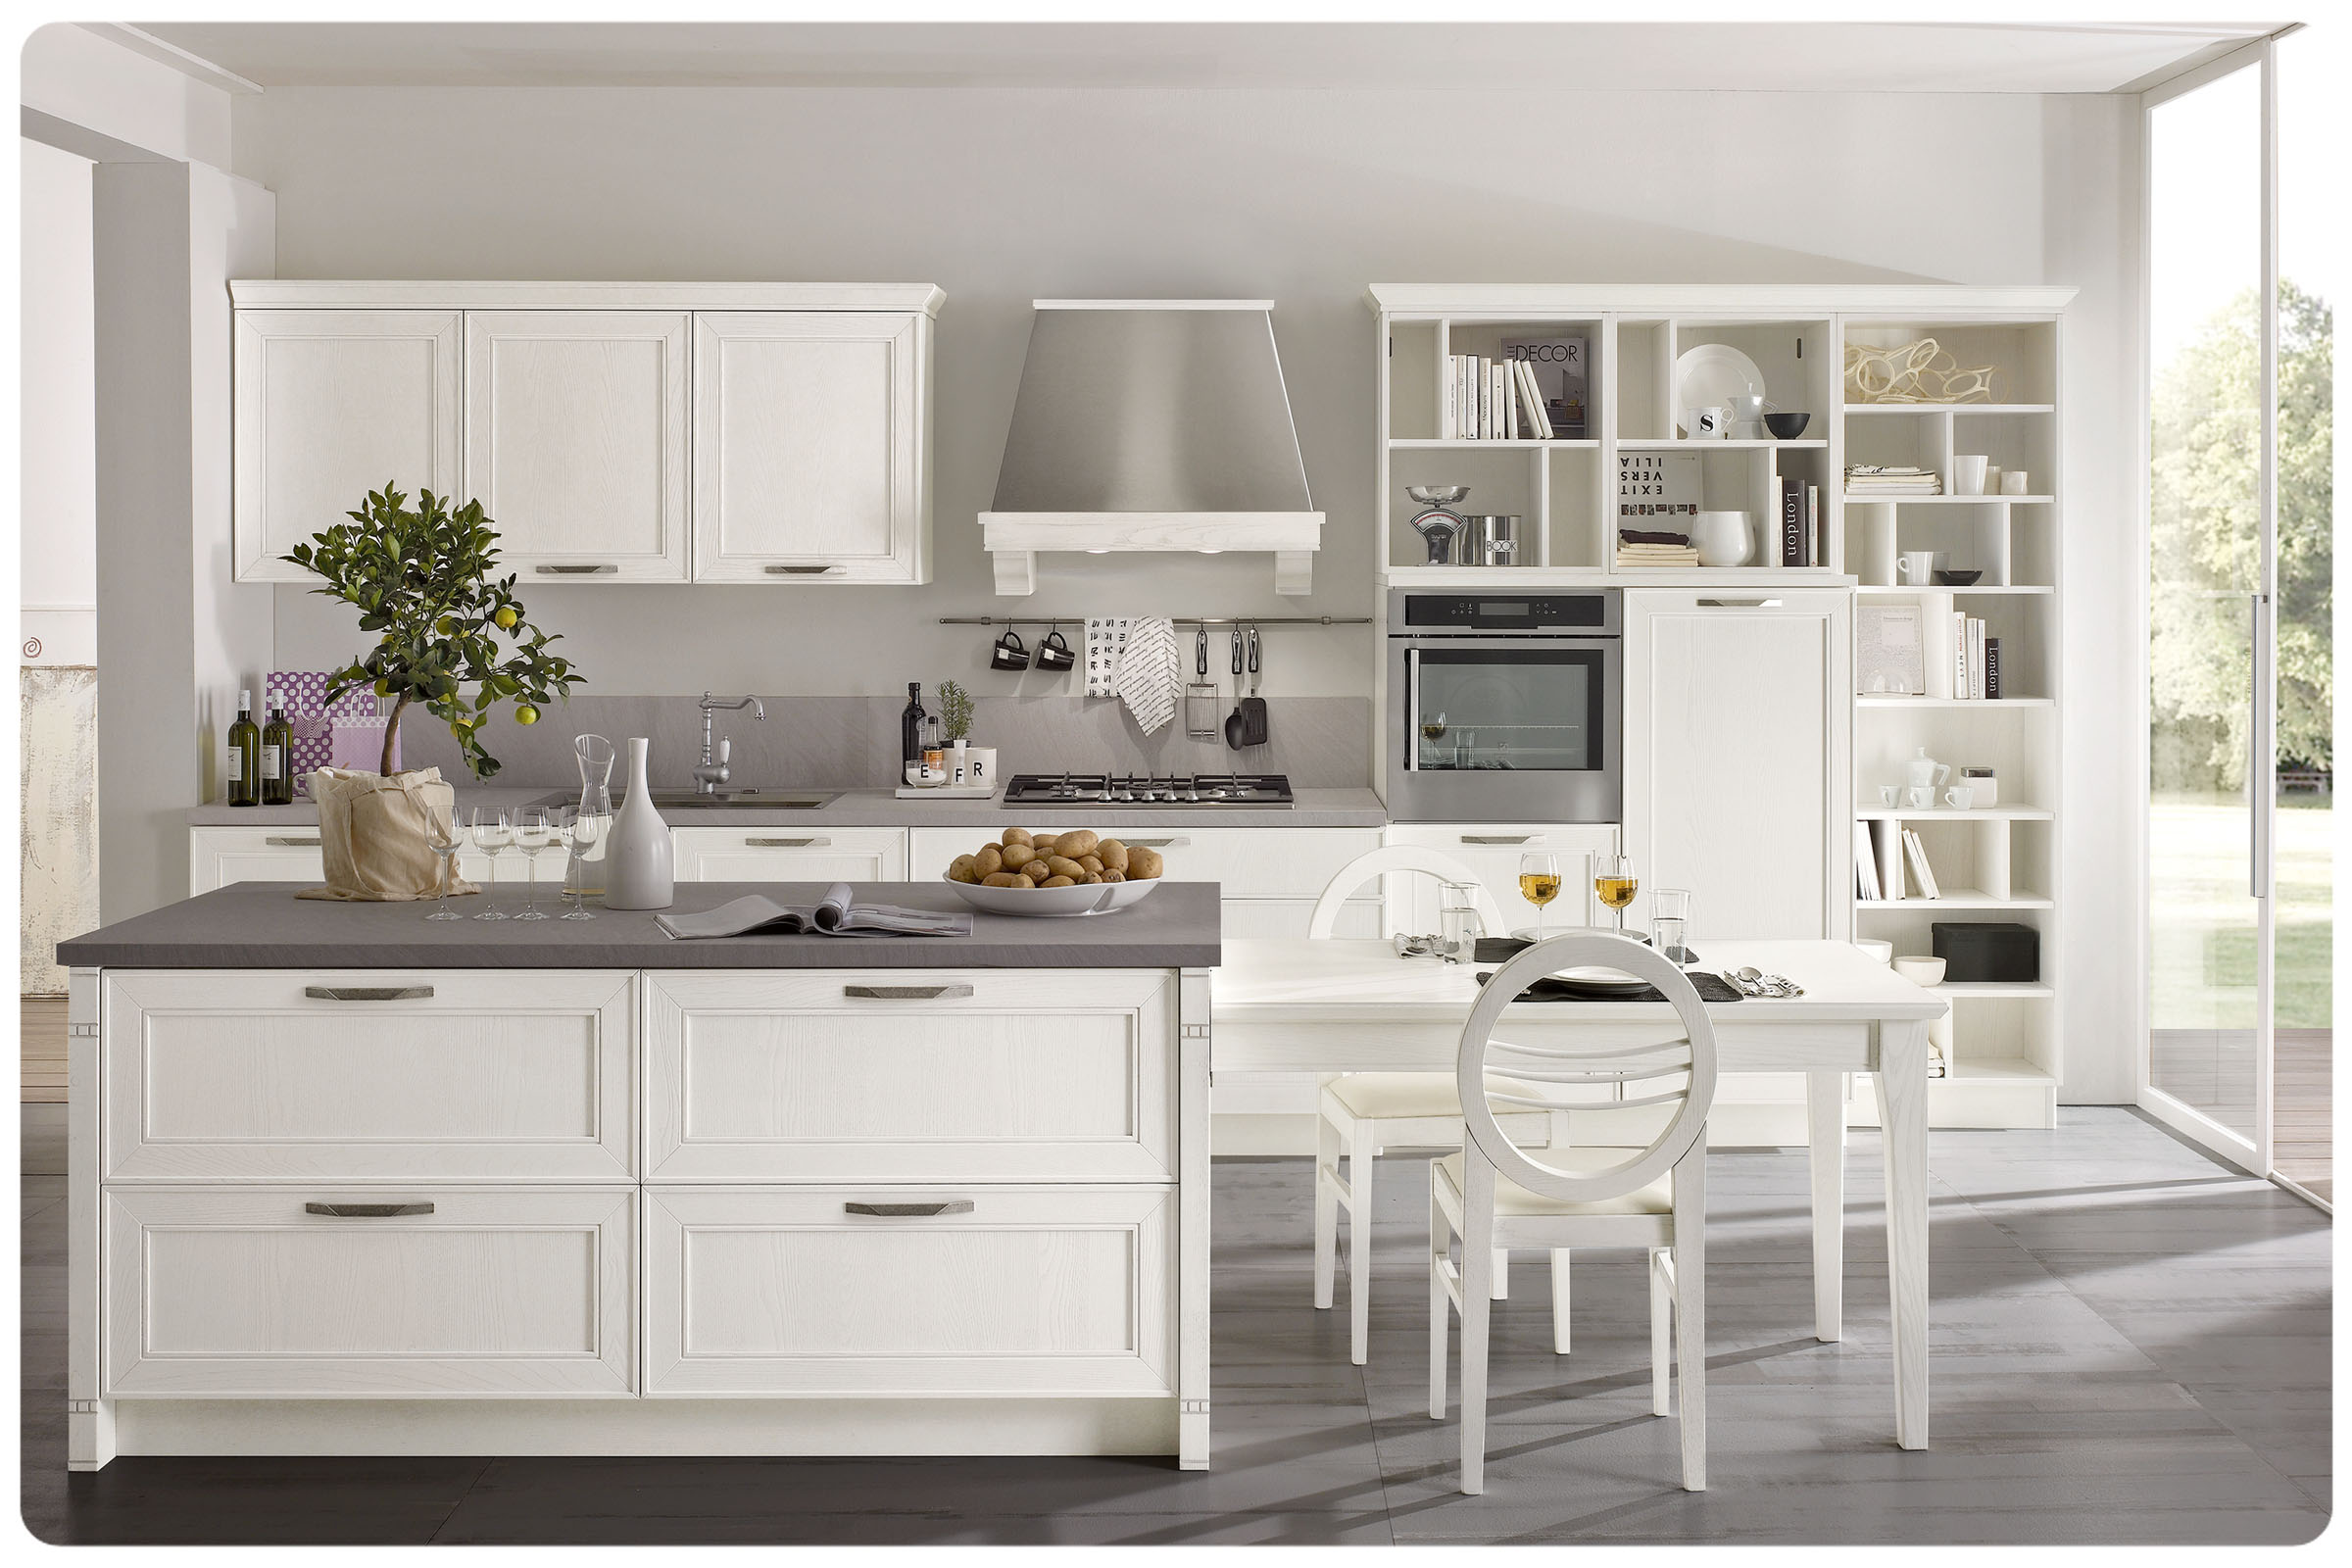 Opinioni cucine stosa 28 images cucine stosa cosa ne pensate vivere insieme forum stunning - Cucine stosa opinioni ...